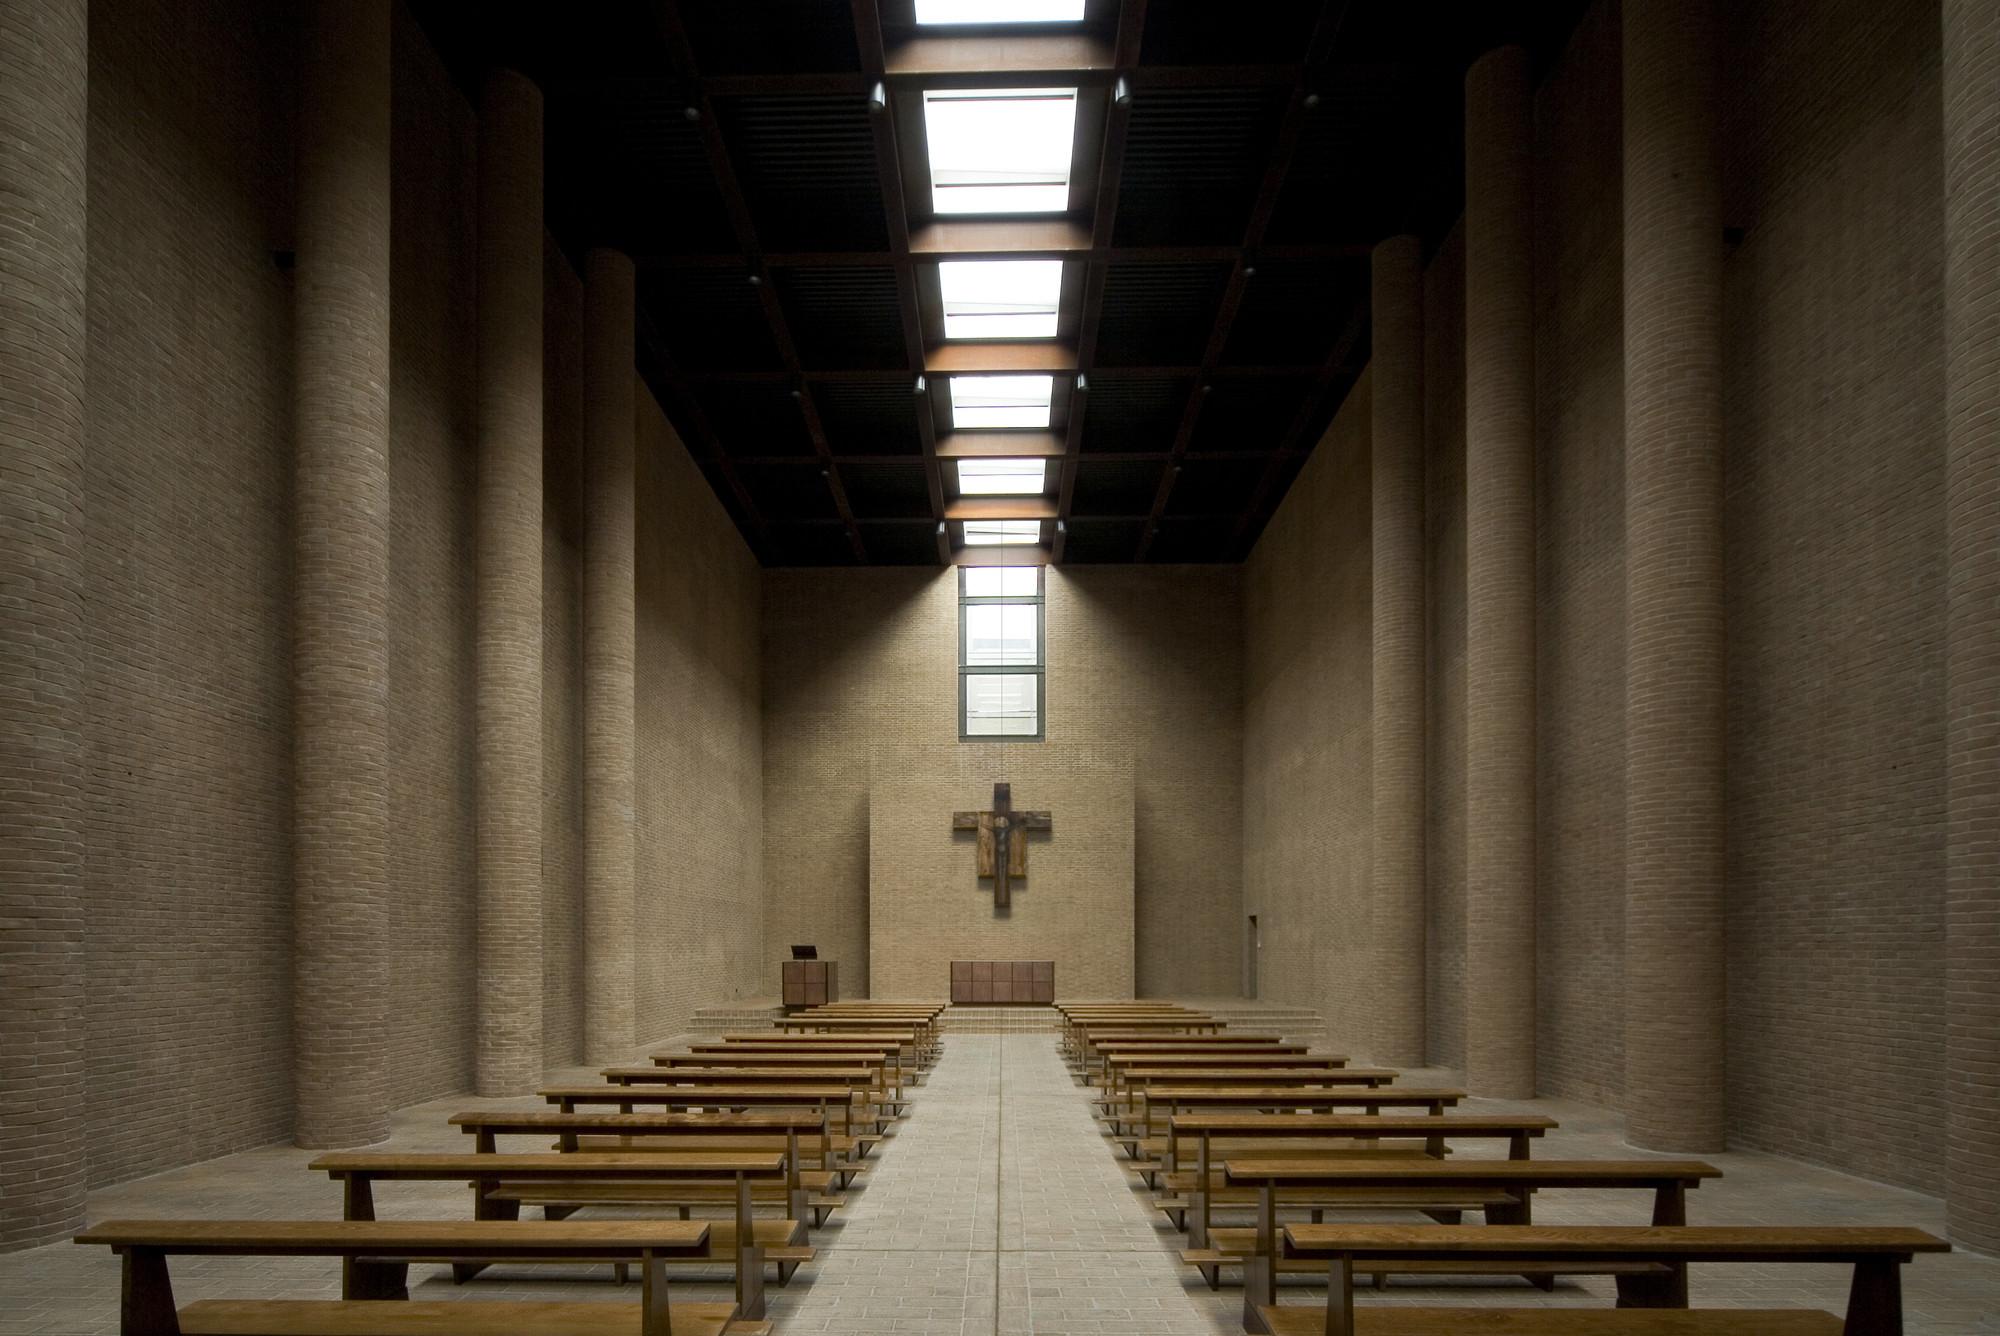 Archivo: La Luz en la Arquitectura Religiosa / Parte 2